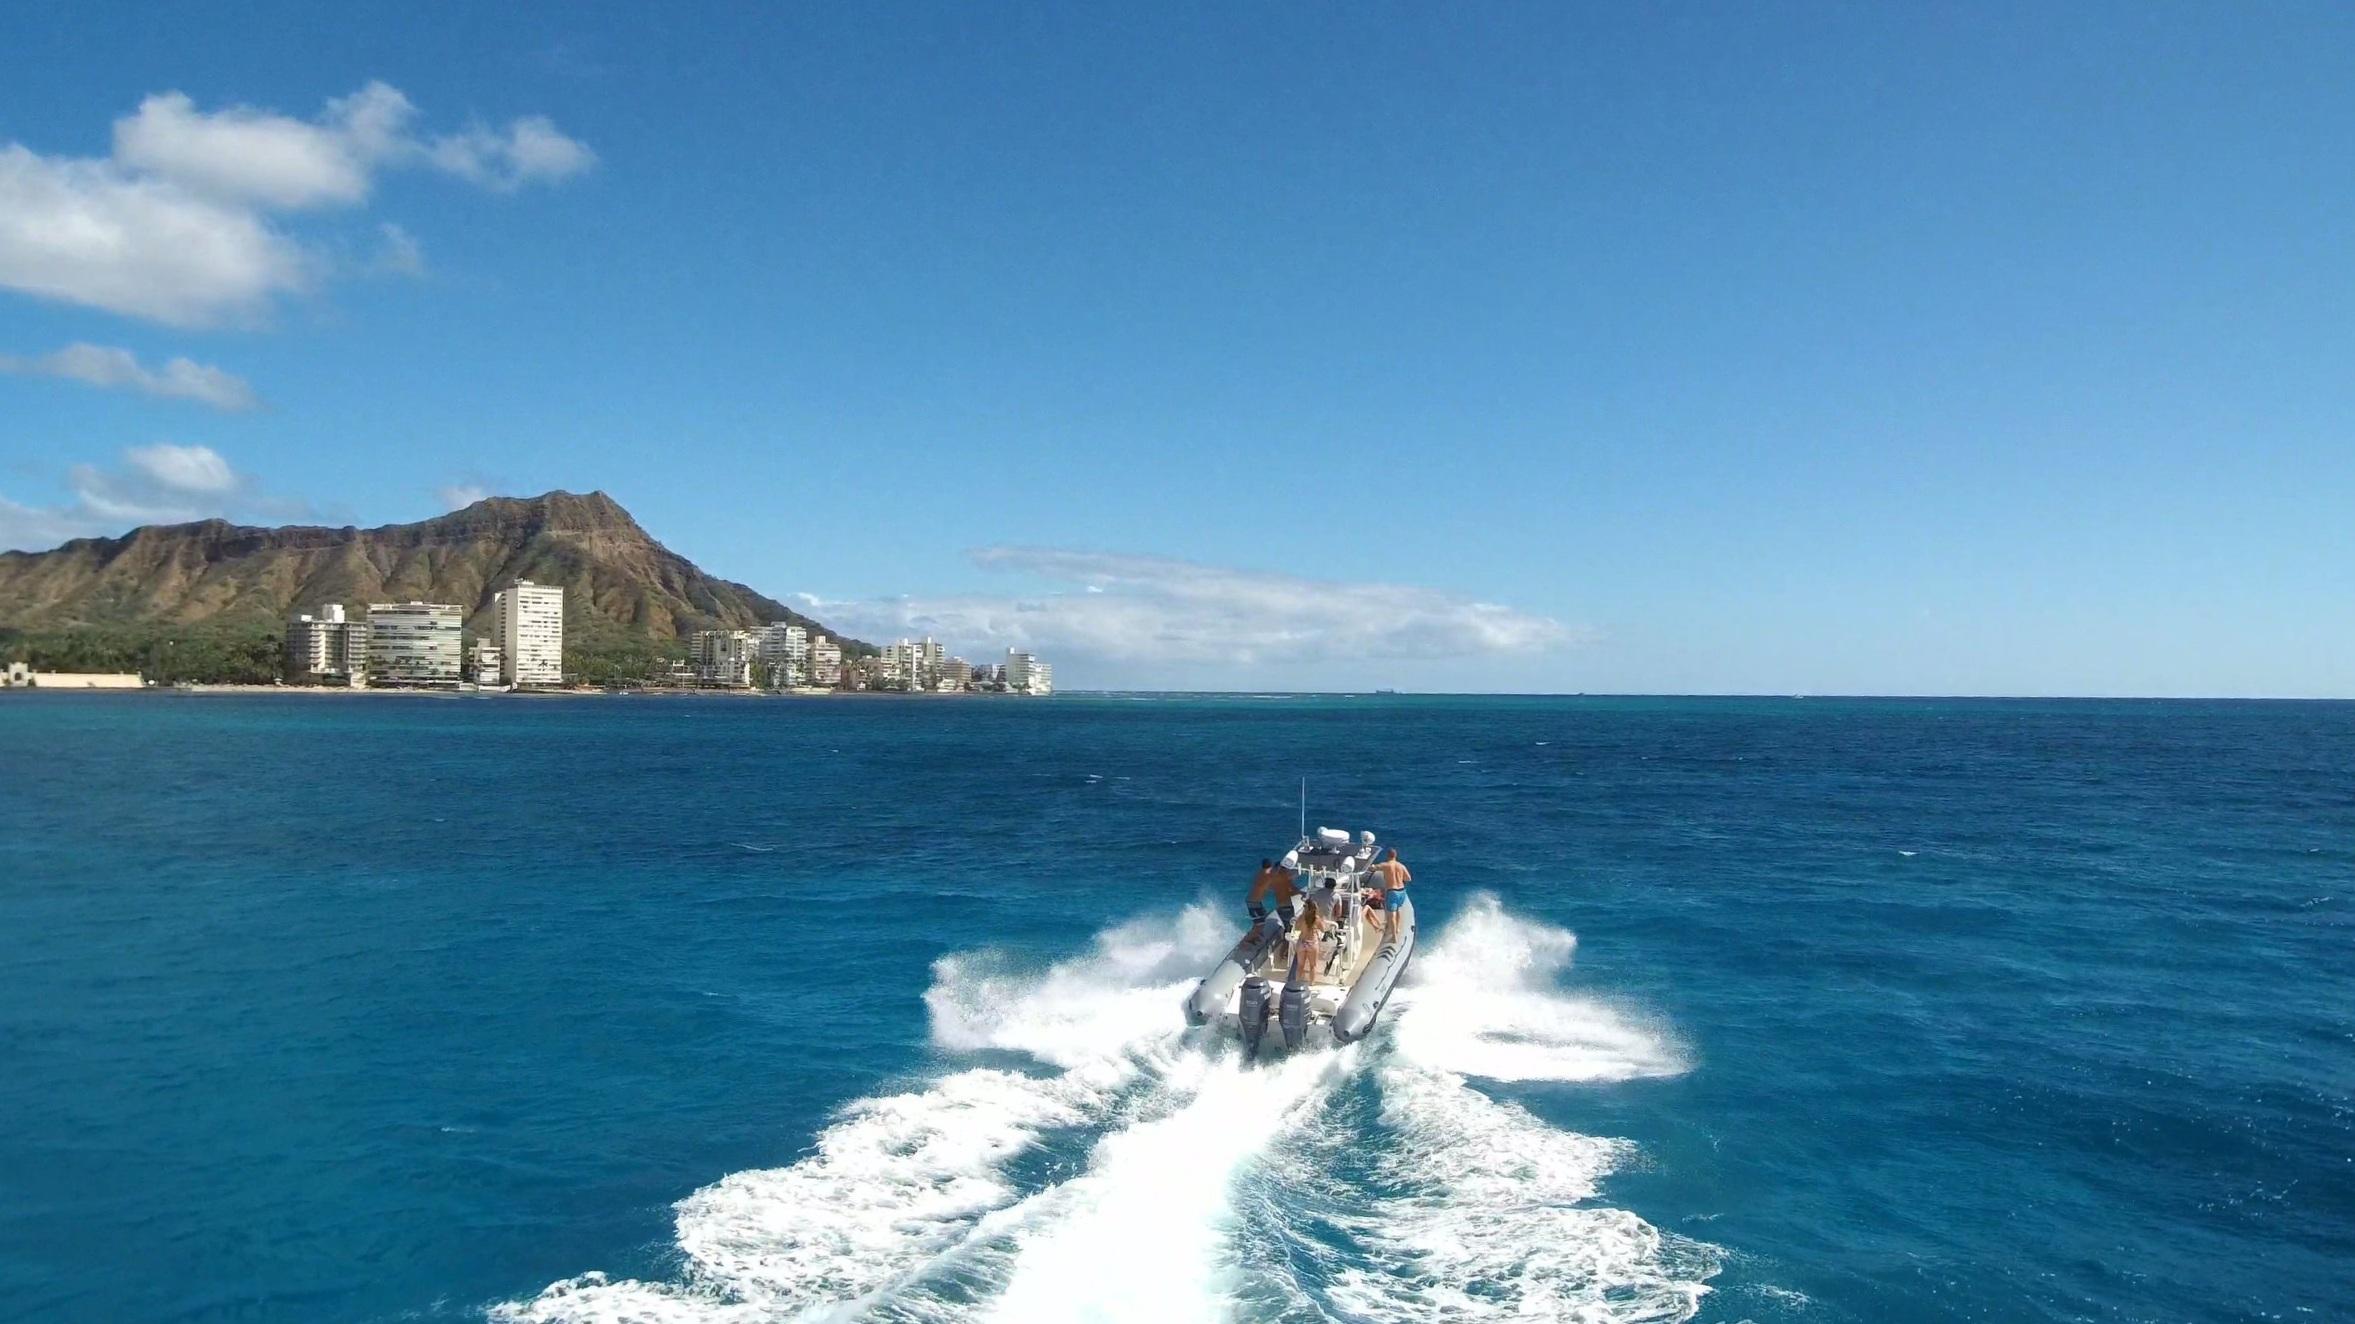 private charter boat tour in Waikiki near Diamond Head